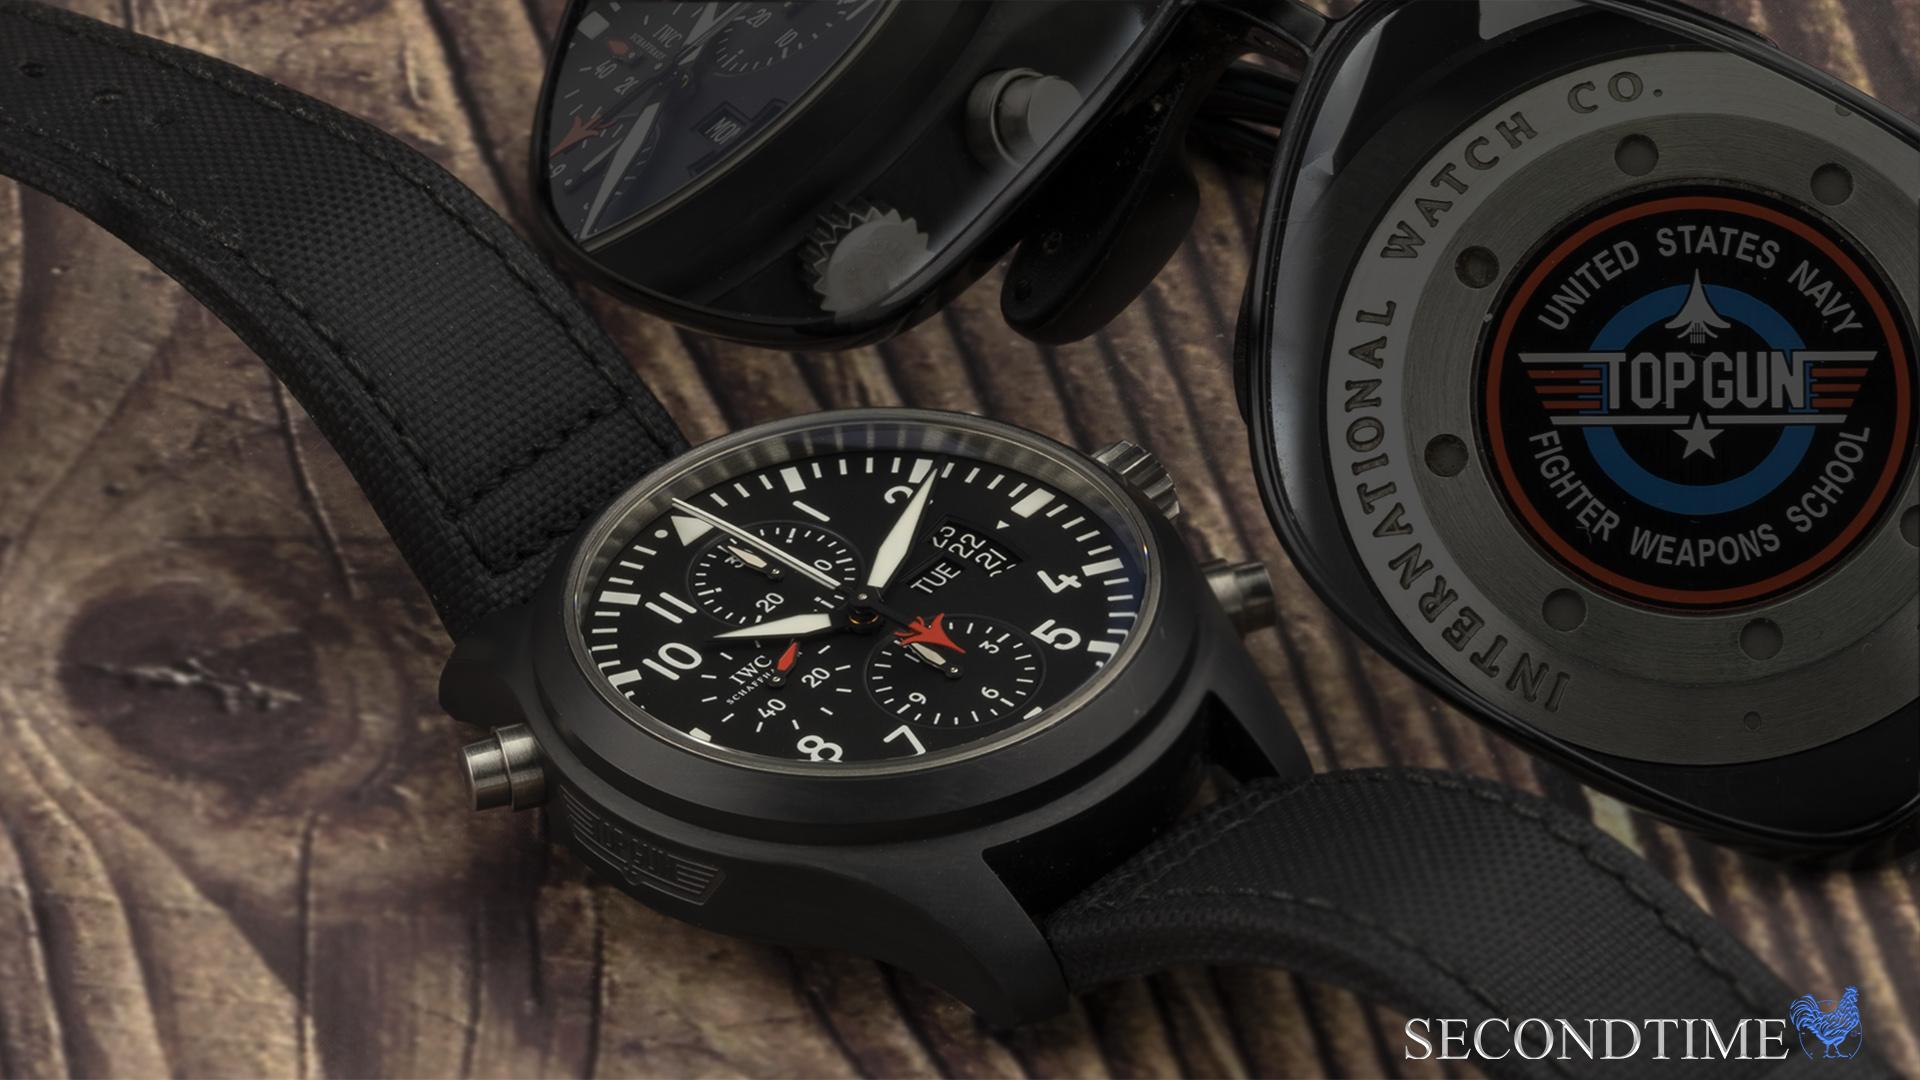 IWC Pilot Double Chronograph TOP GUN  Ref - IW379901